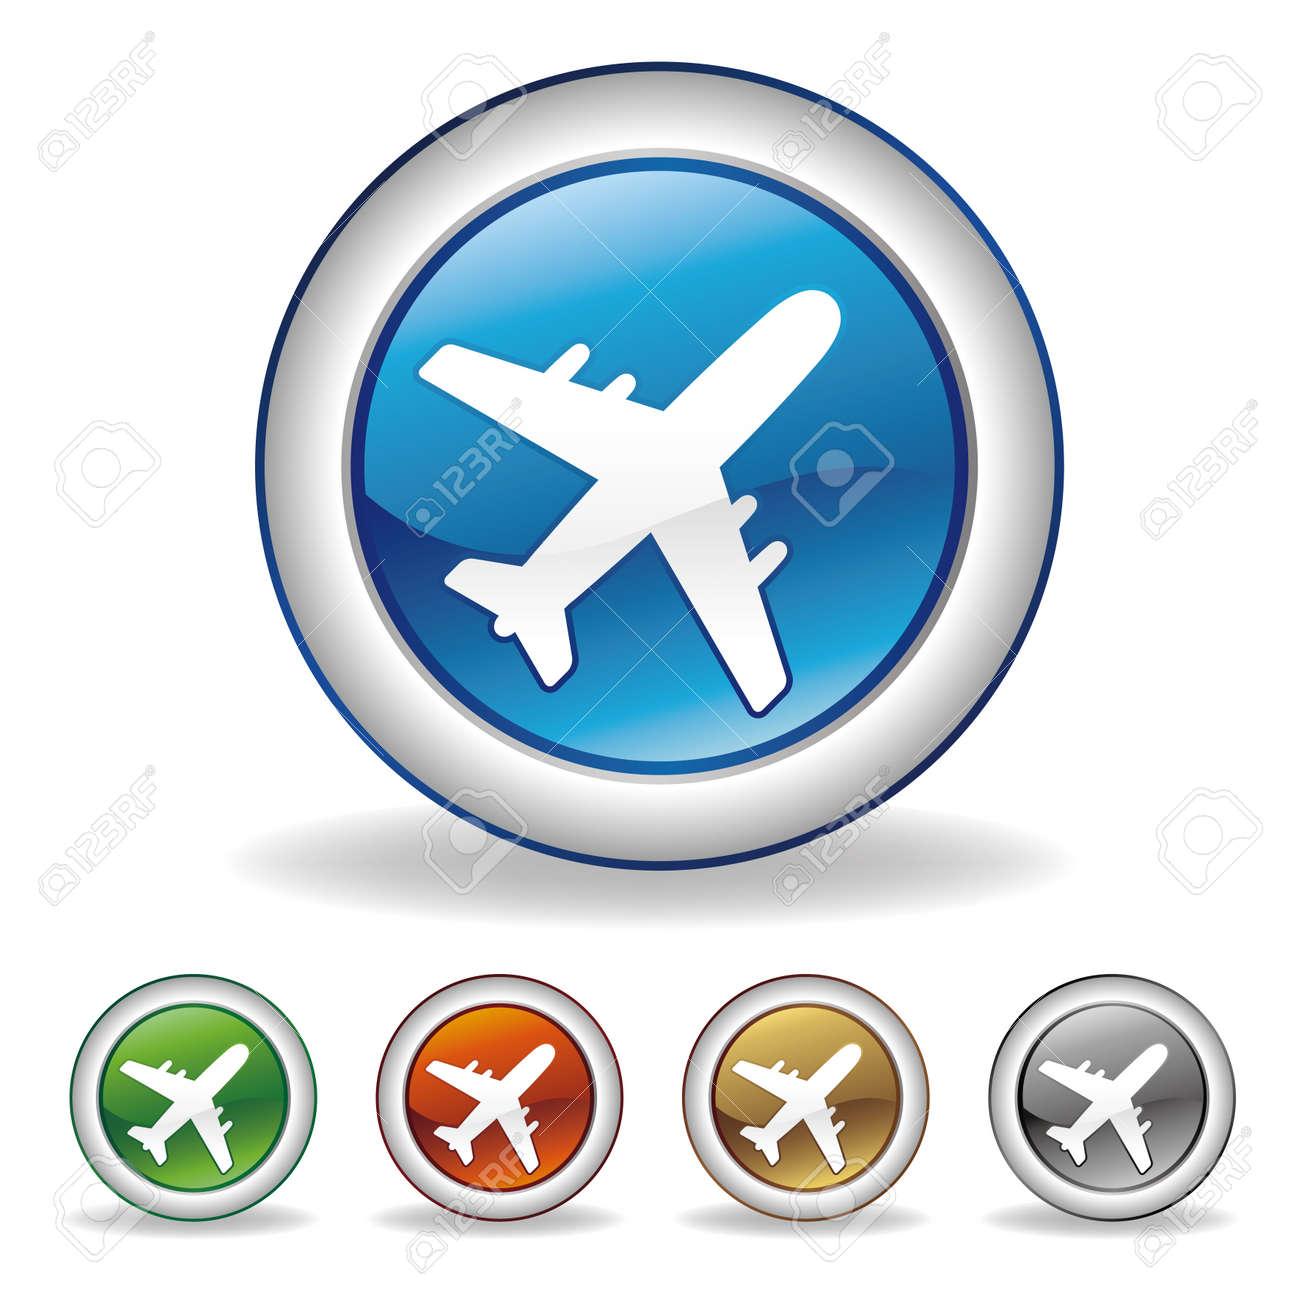 airplane icon Stock Vector - 7558106